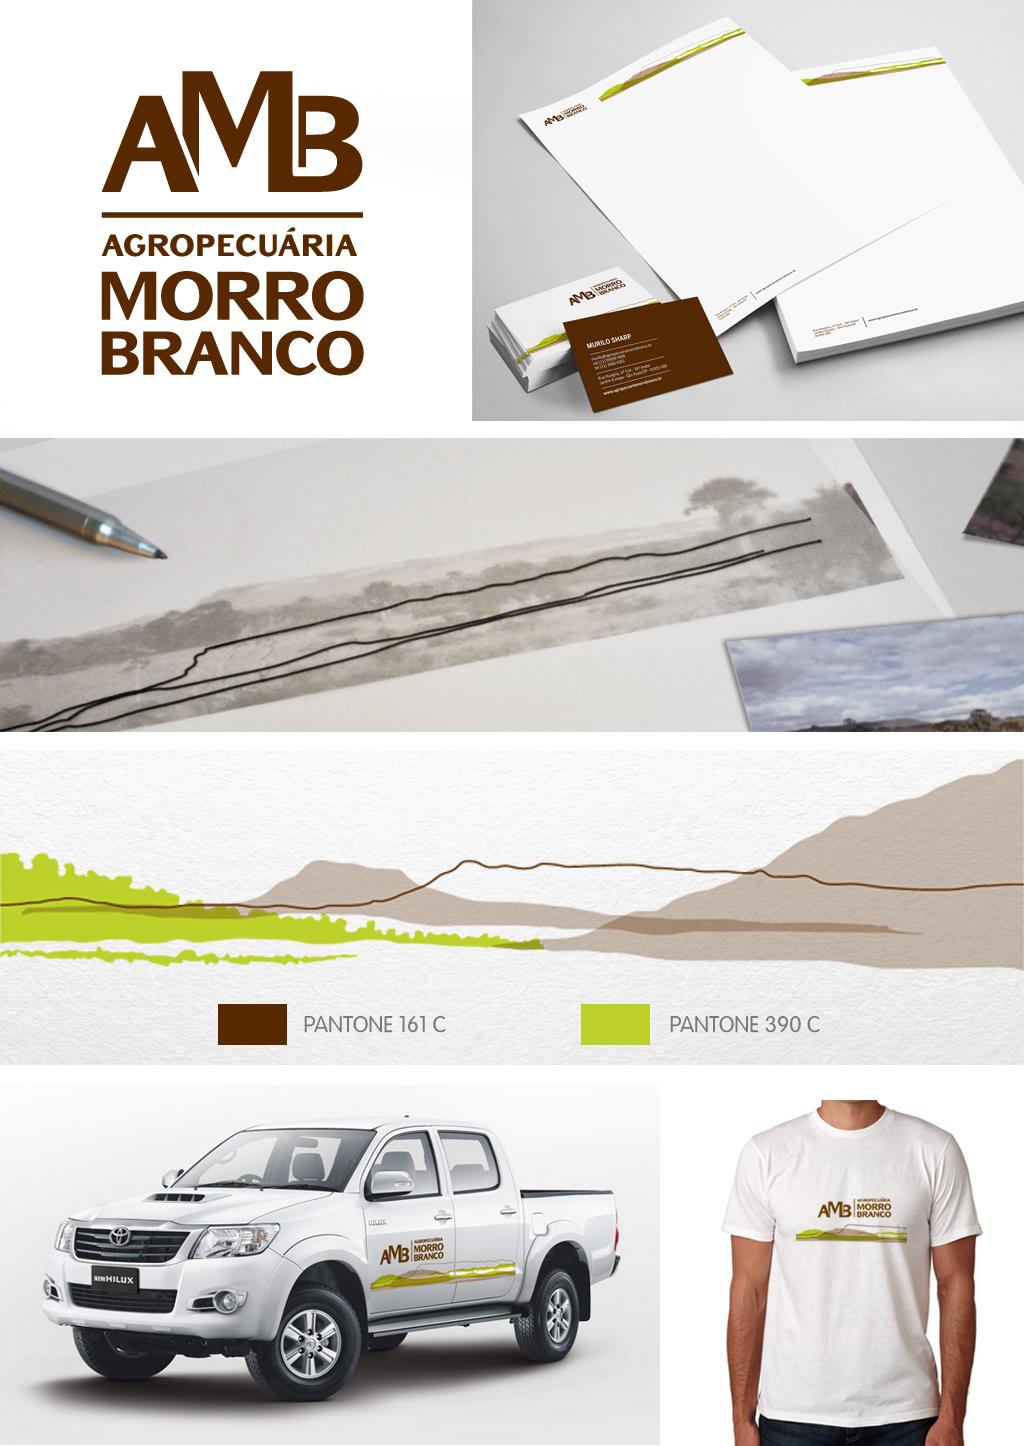 g_gde_agro_morro_branco